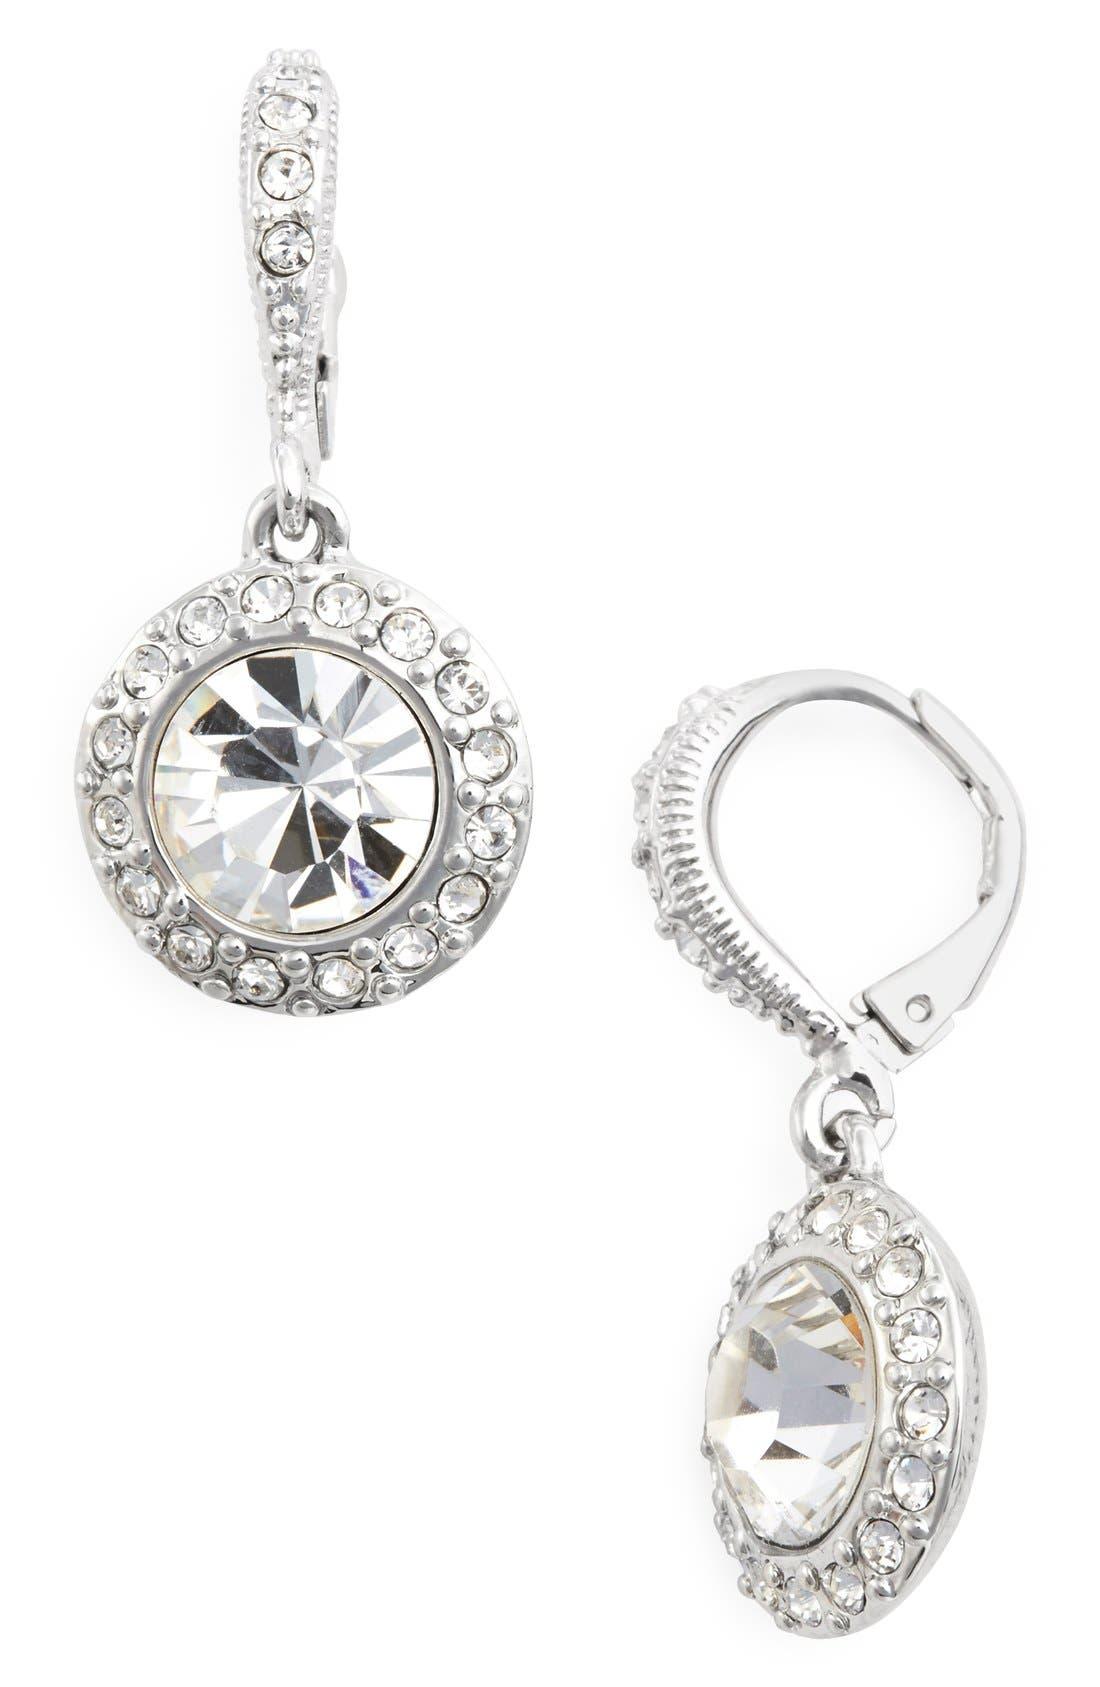 Crystal Drop Earrings,                         Main,                         color, Silver/ Crystal